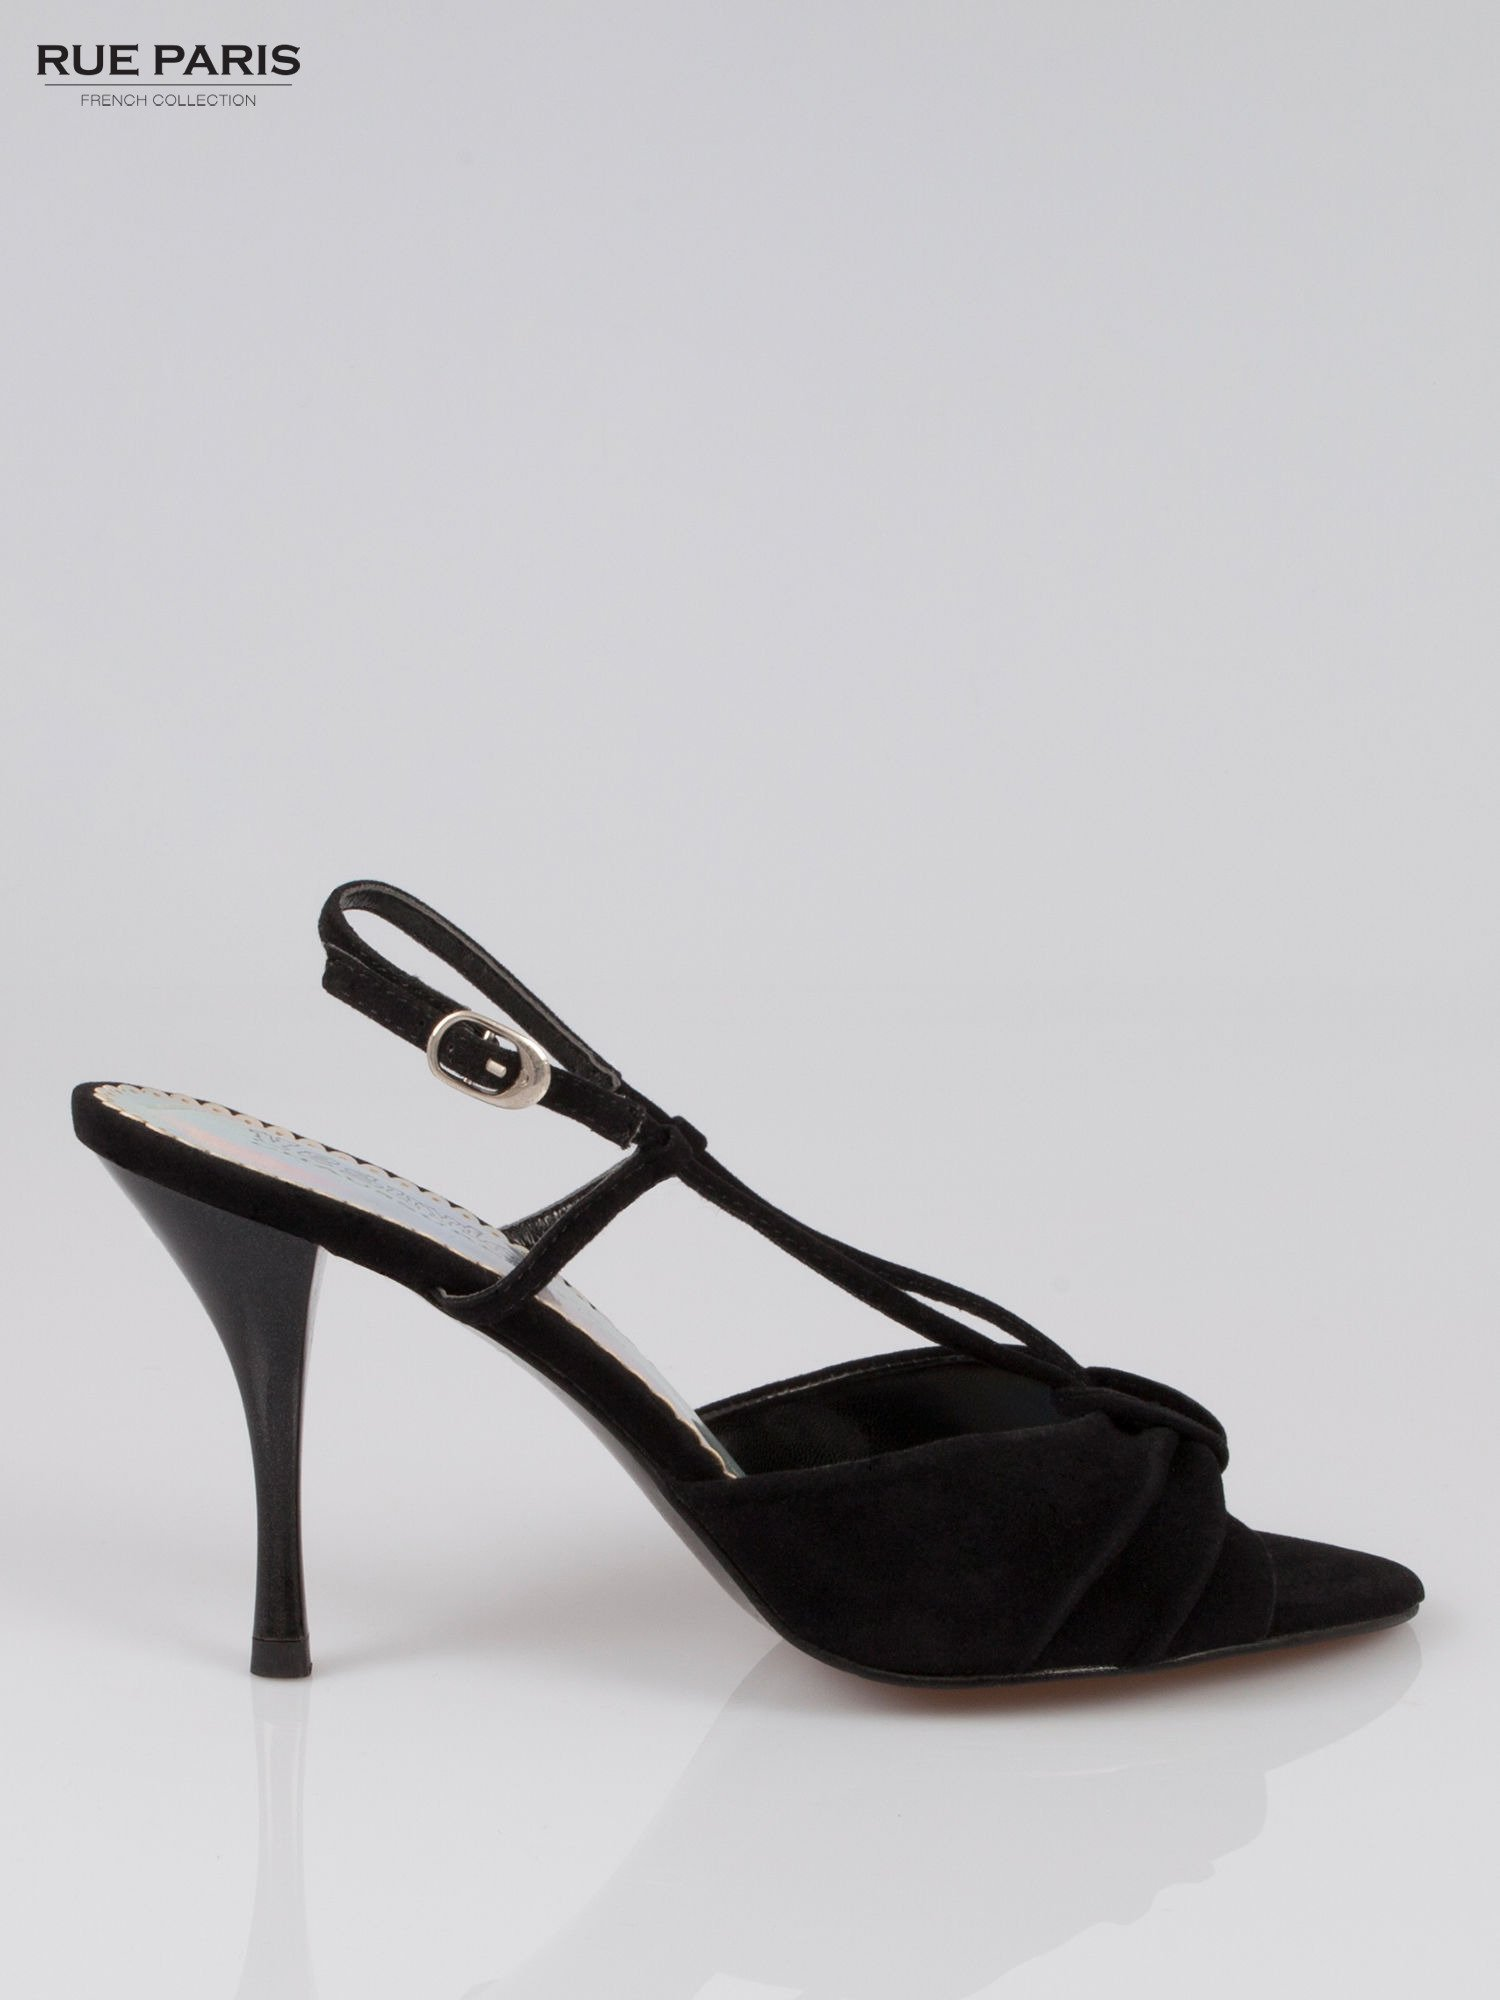 Czarne zamszowe szpilki faux suede                                  zdj.                                  1